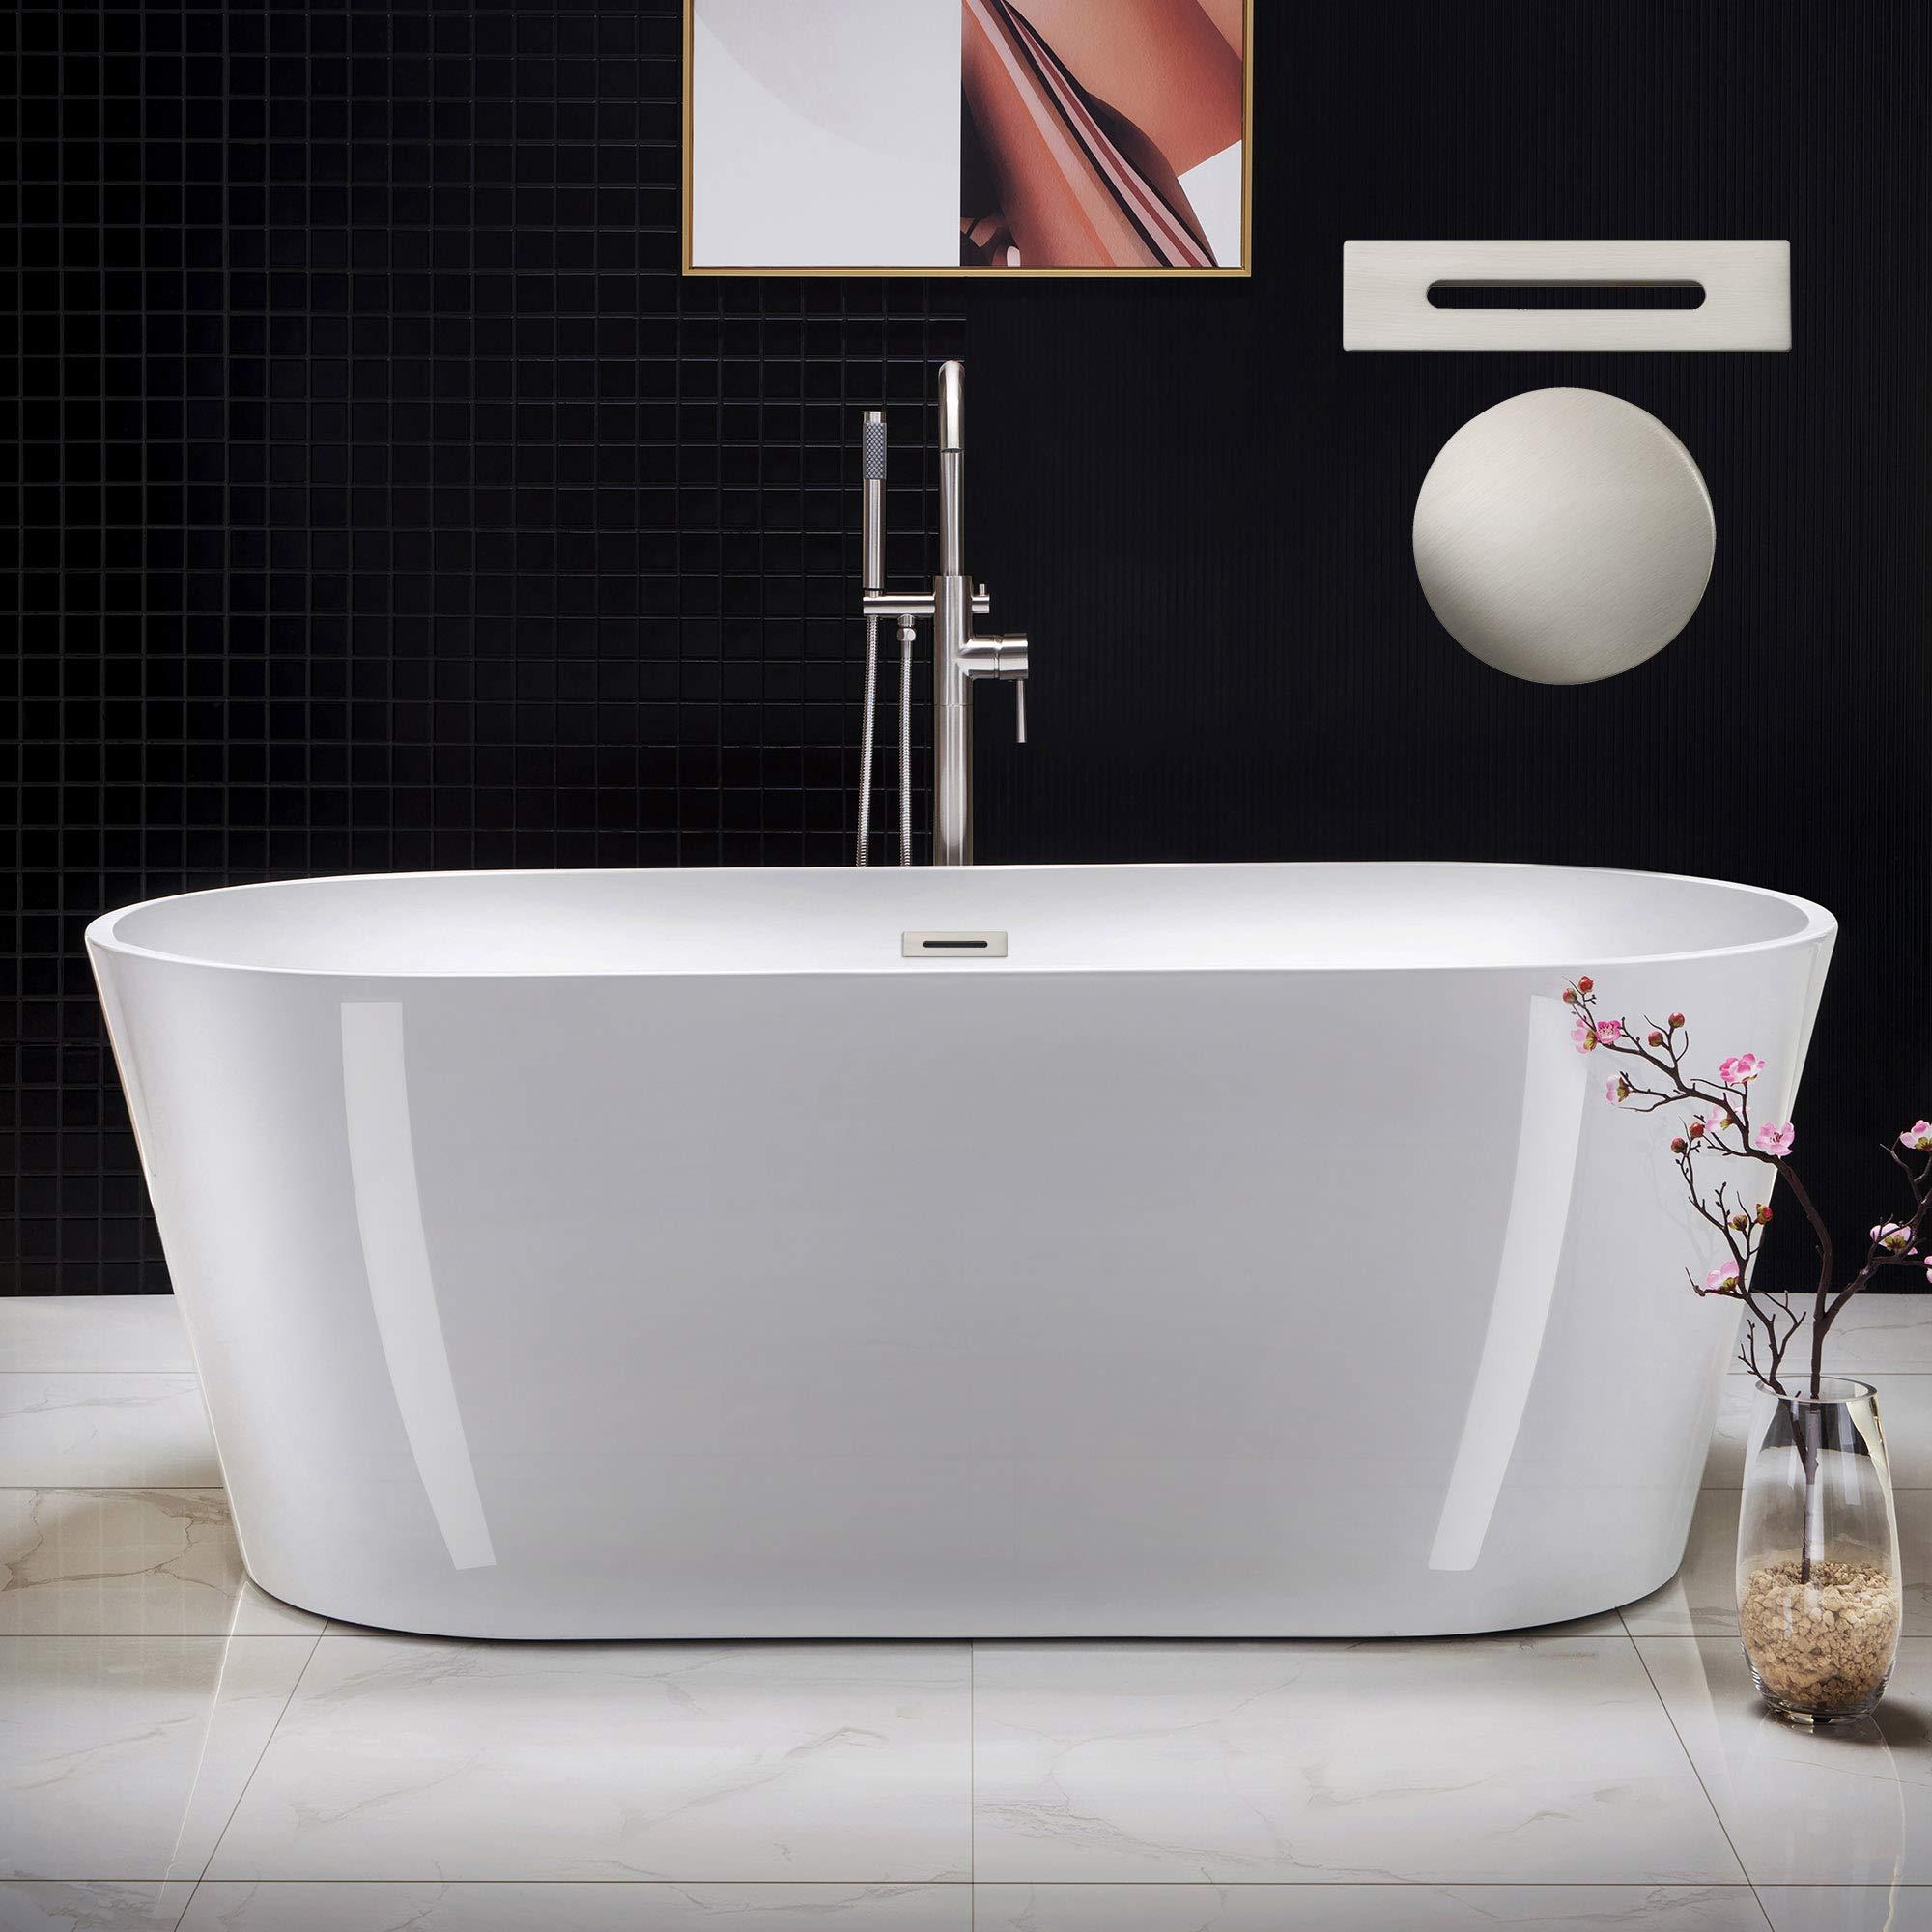 WOODBRIDGE B-0013-B/N-Drain &O Bathtub, White